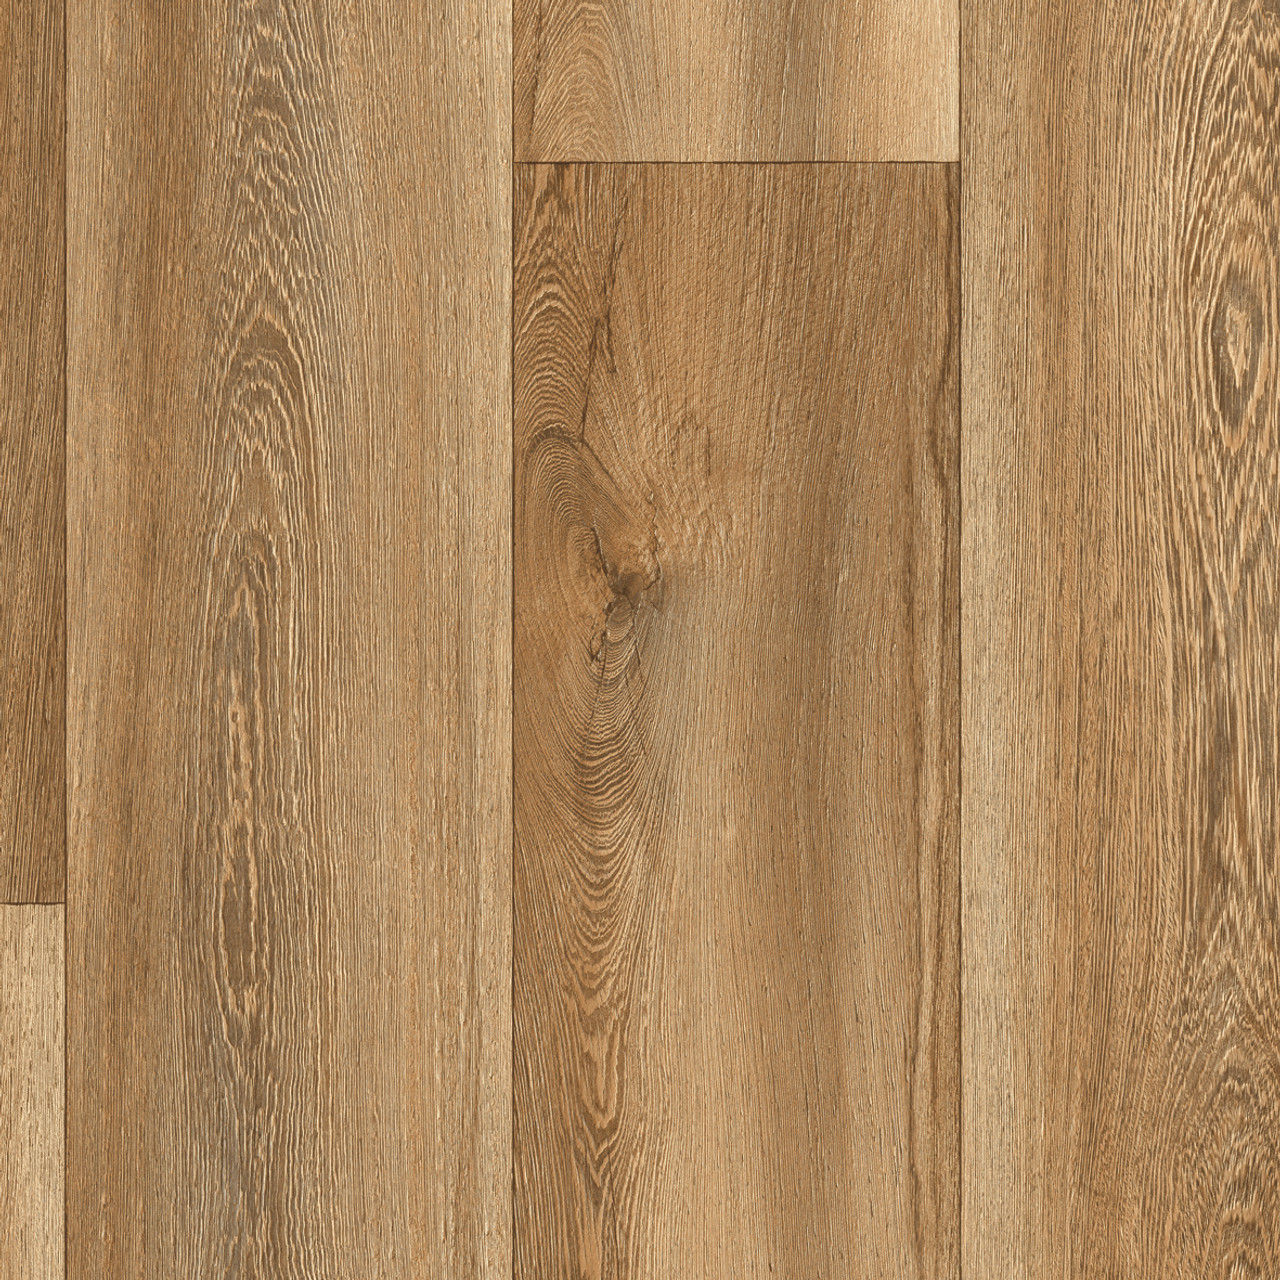 Beliebt CFS Cozitex Cushion Flooring Medium Oak 734 | Floormart ZW69